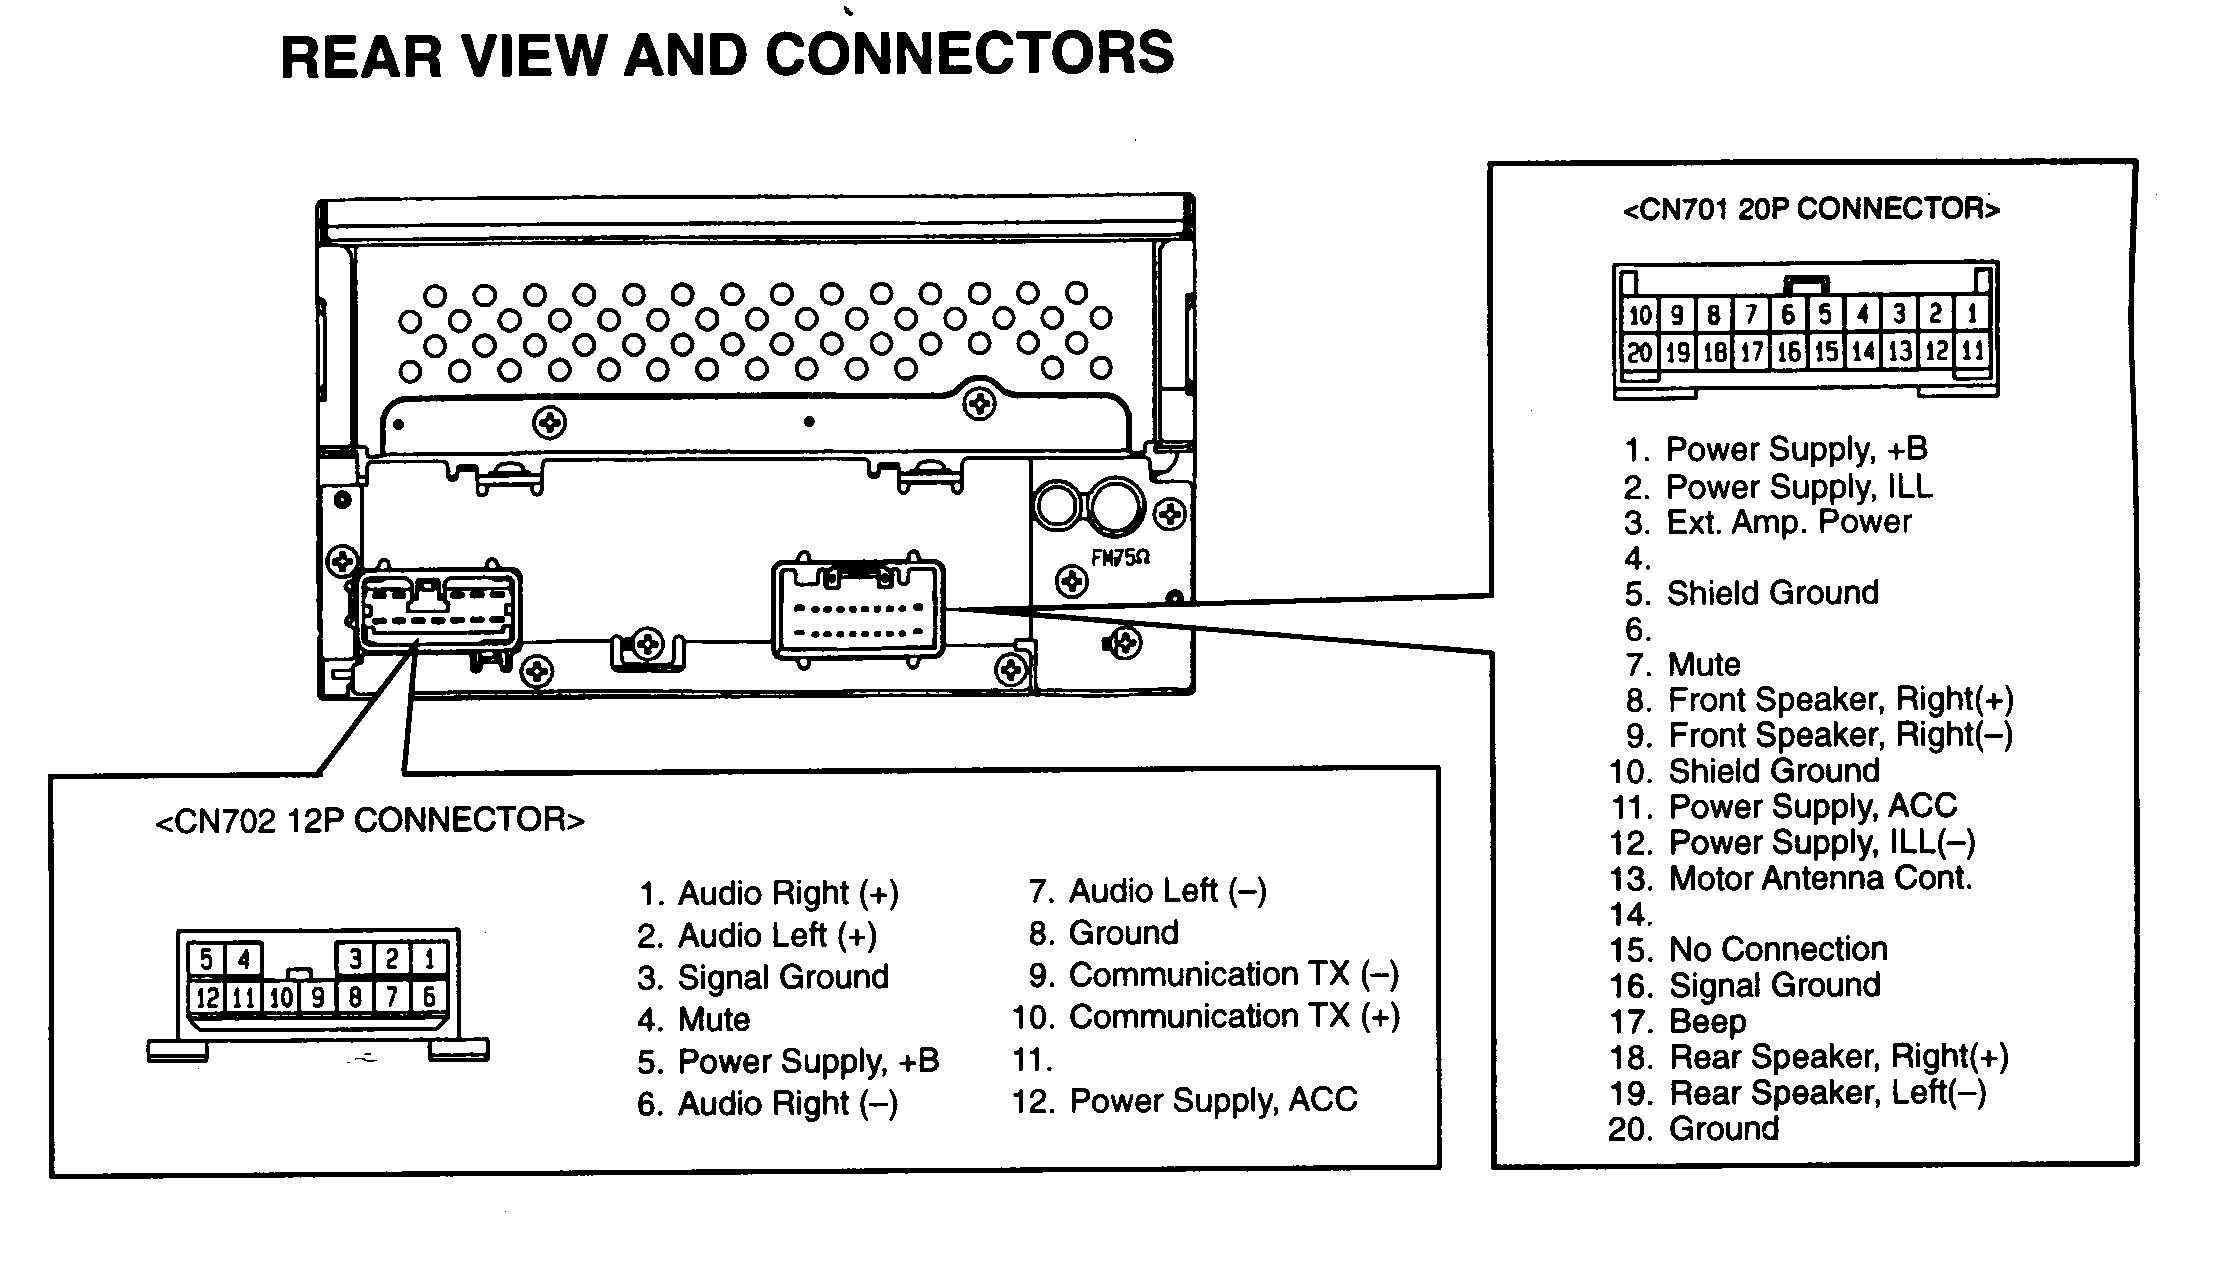 2001 Toyota Camry Wiring Diagram New Vdj79 In Radio Britishpanto Datas